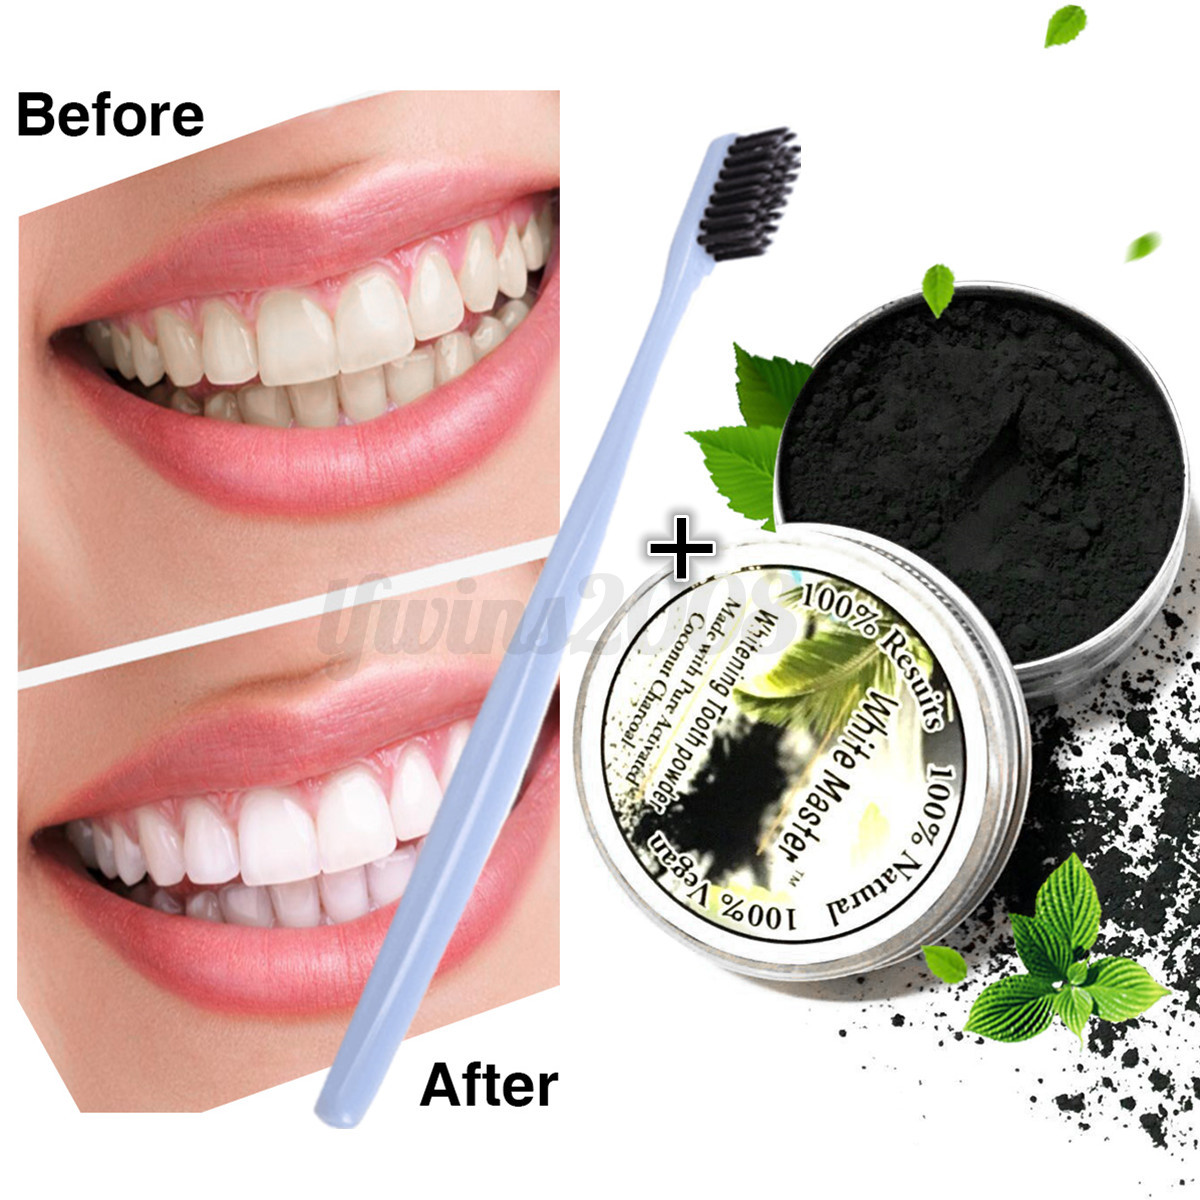 naturel blanchiment des dents poudre de bambou charbon actif brosse dentaire ebay. Black Bedroom Furniture Sets. Home Design Ideas